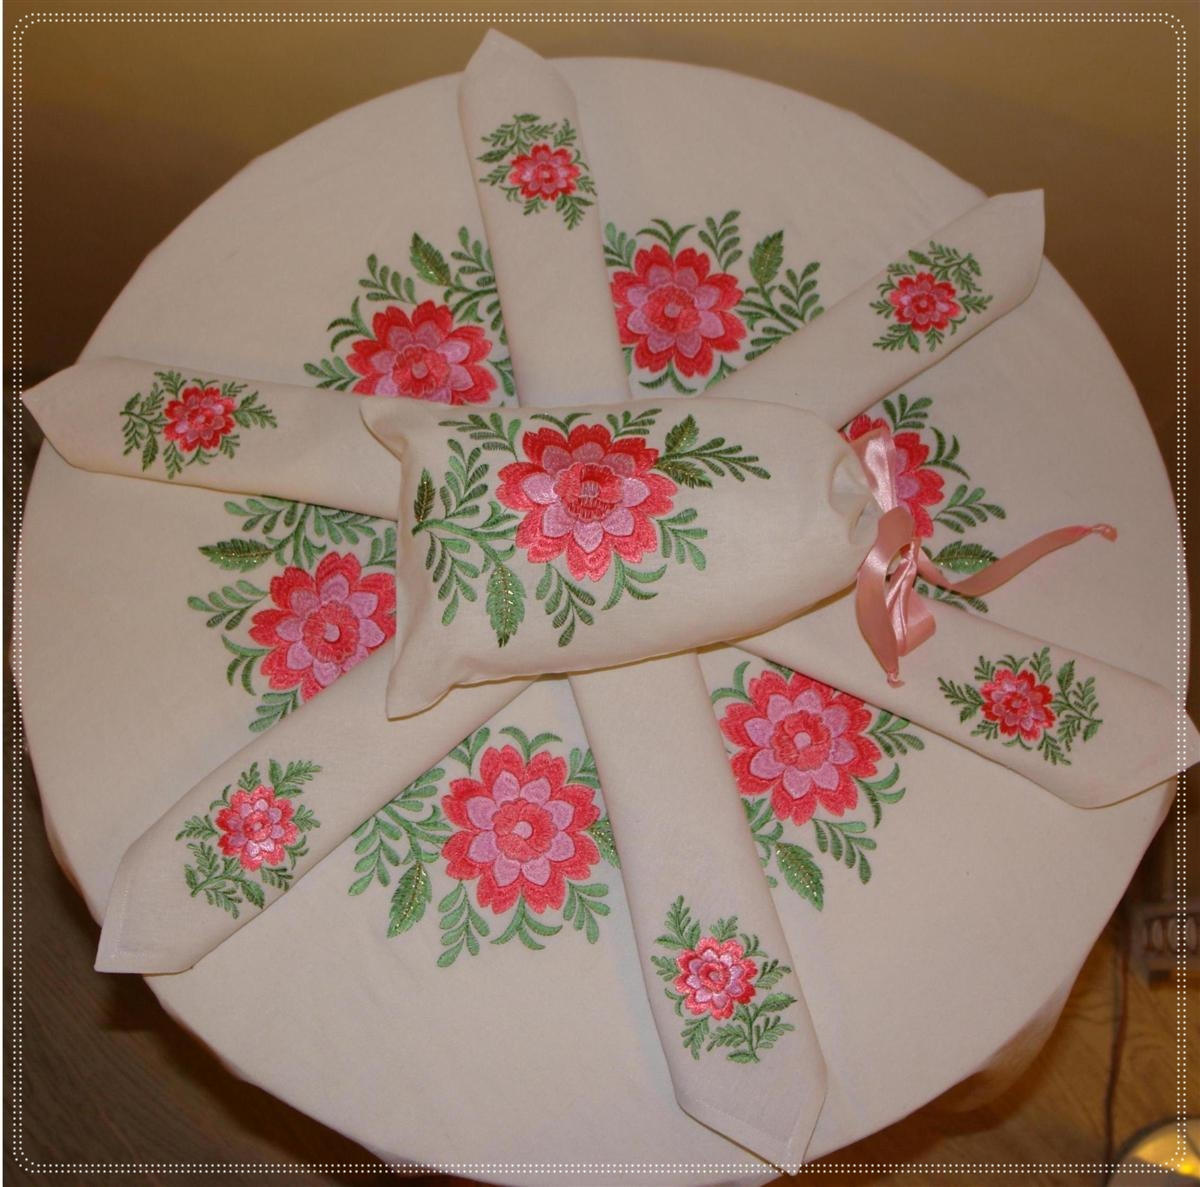 Applique designs for tablecloth - Tablecloth